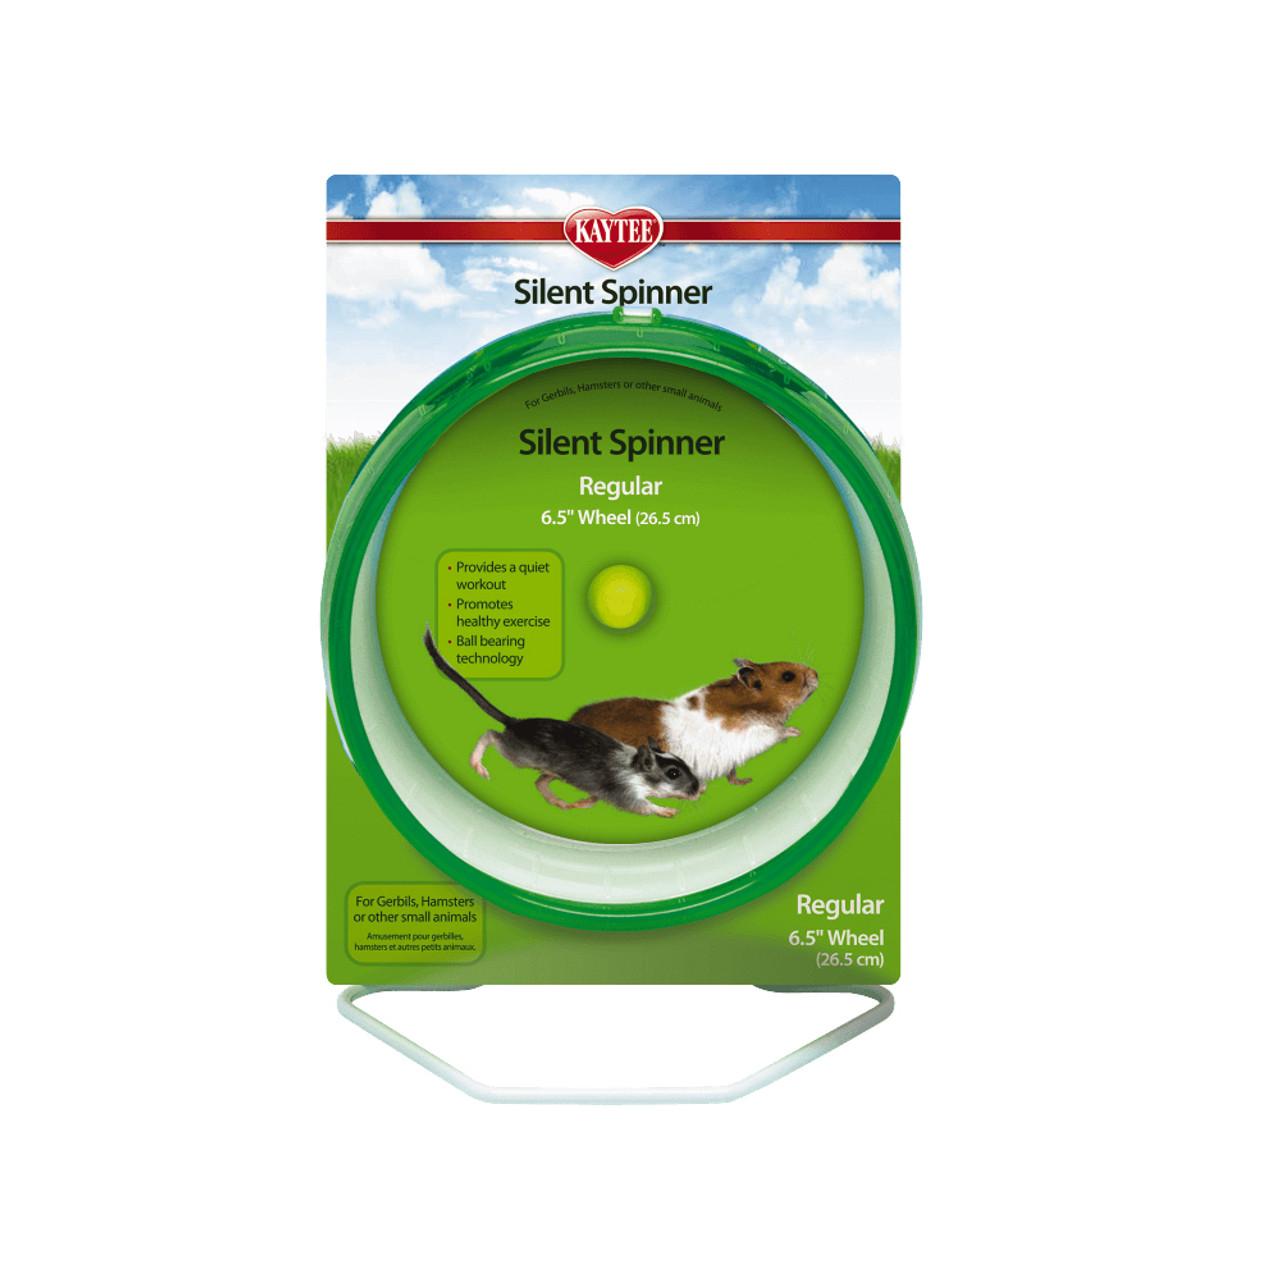 Kaytee Silent Spinner Wheel for Small Animals